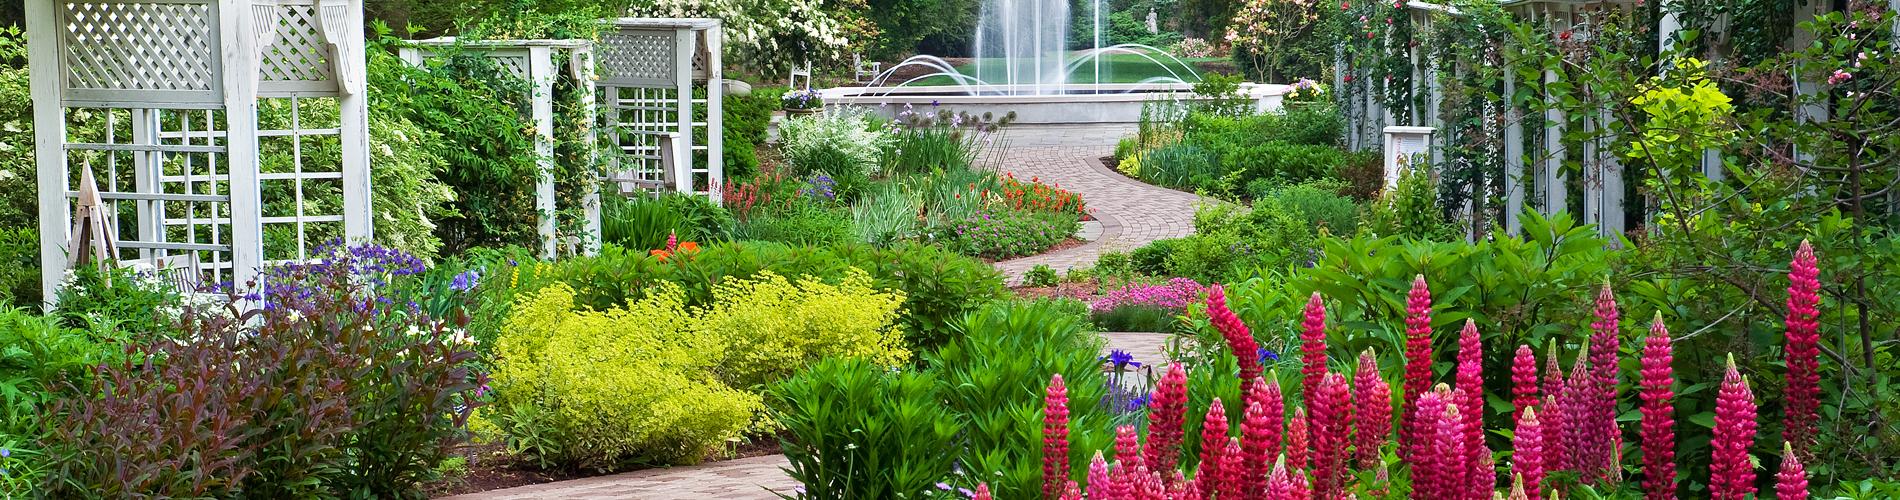 Mill Creek Metro Parks - Fellows Riverside Gardens, Youngstown, Ohio